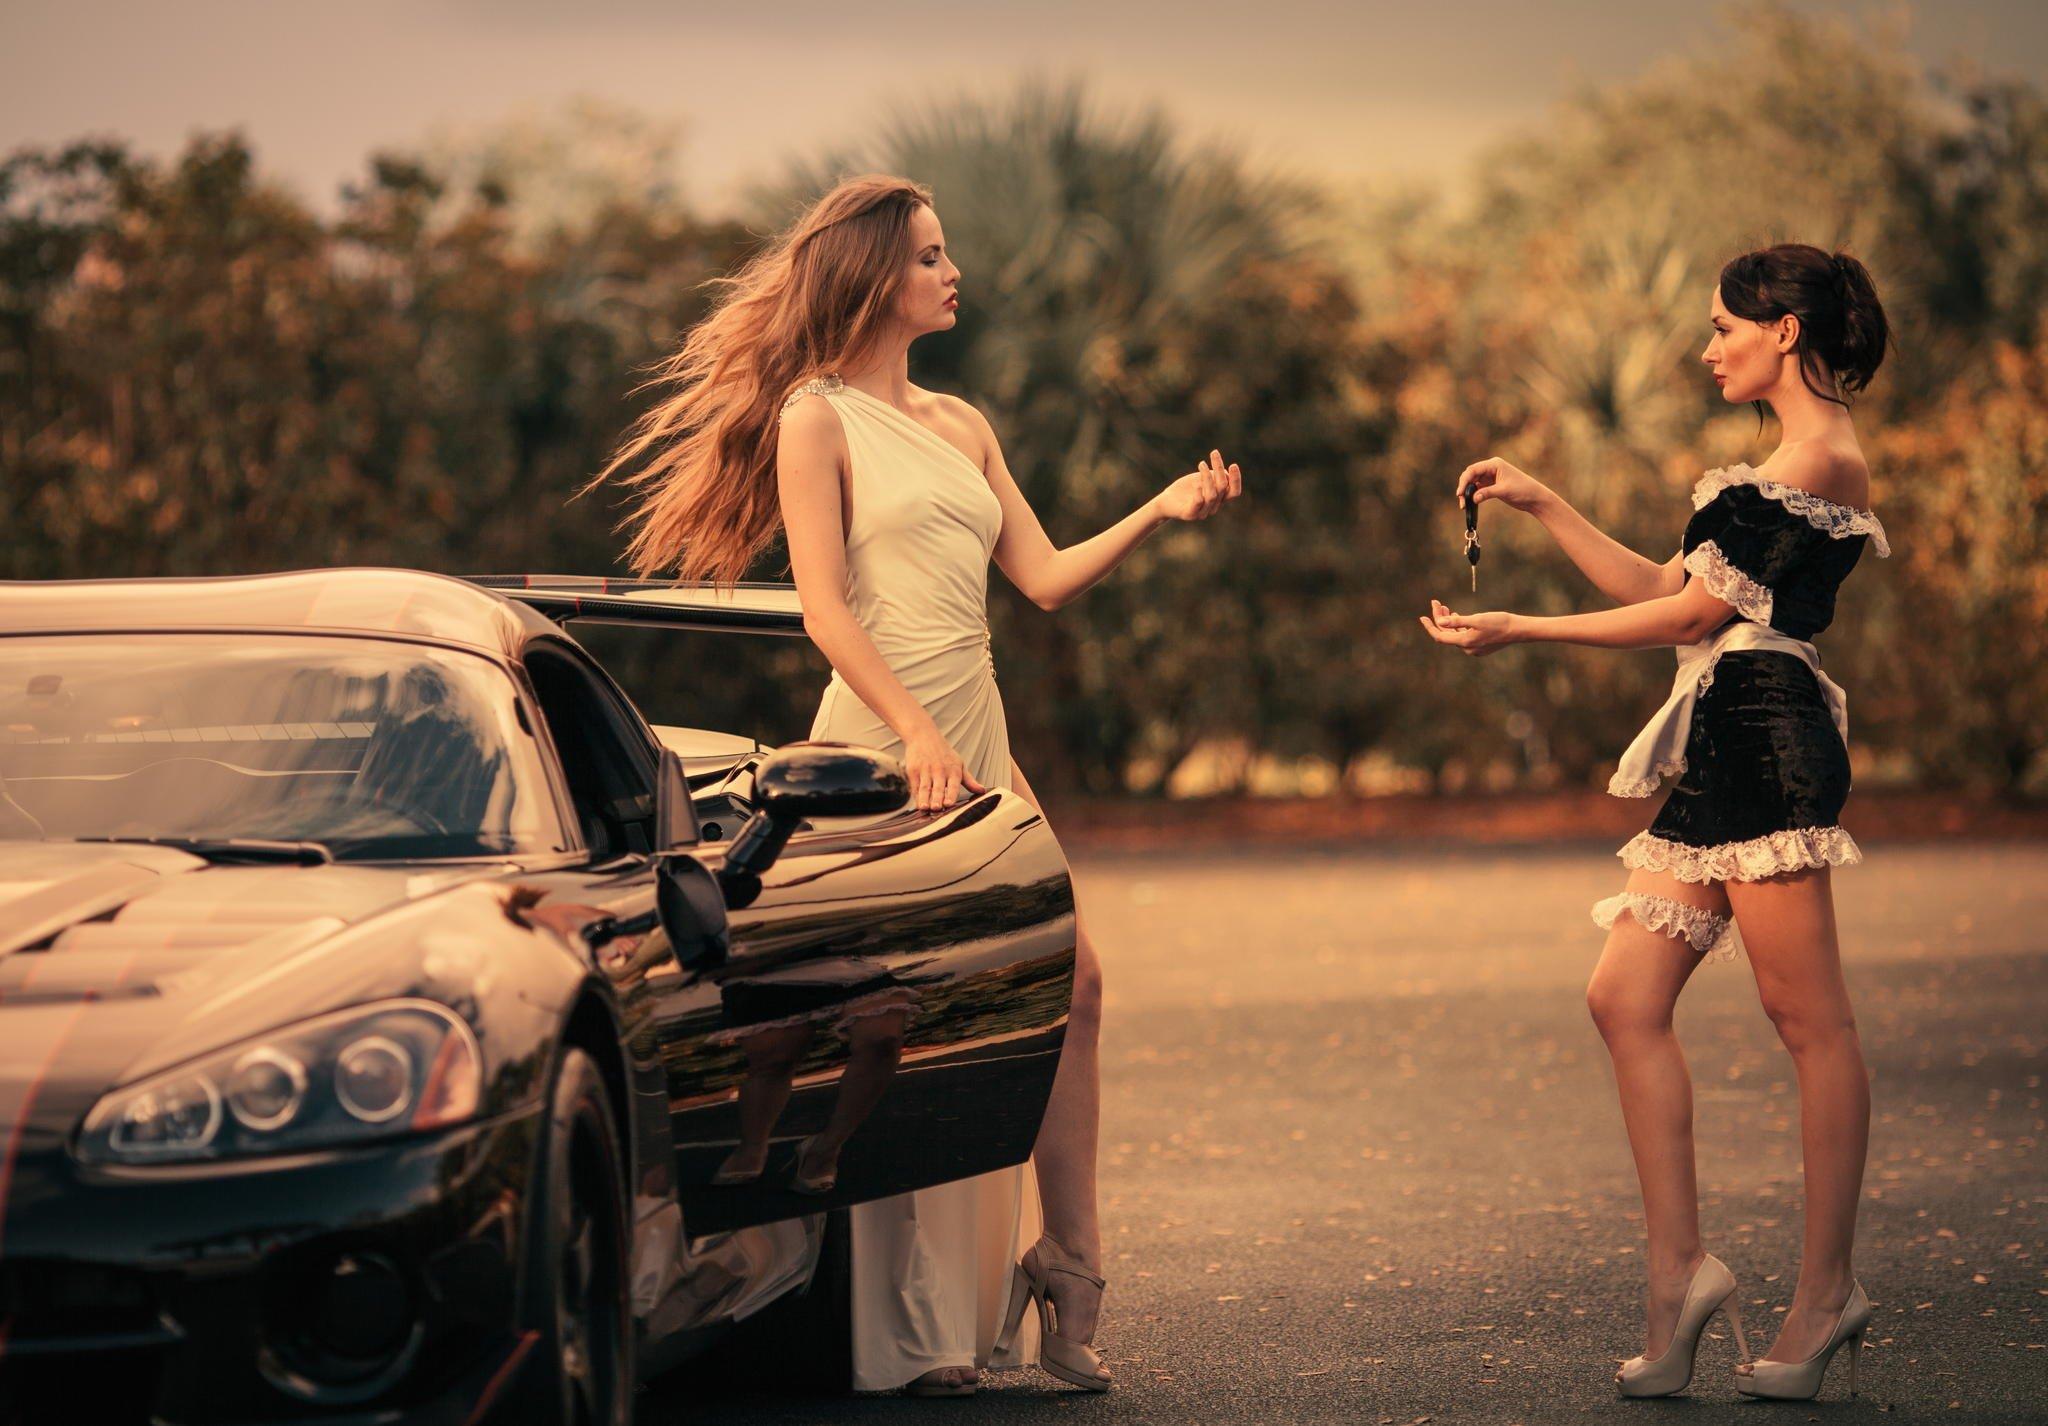 Dodge luxury life women viper girls wallpaper 2048x1426 for Luxury women